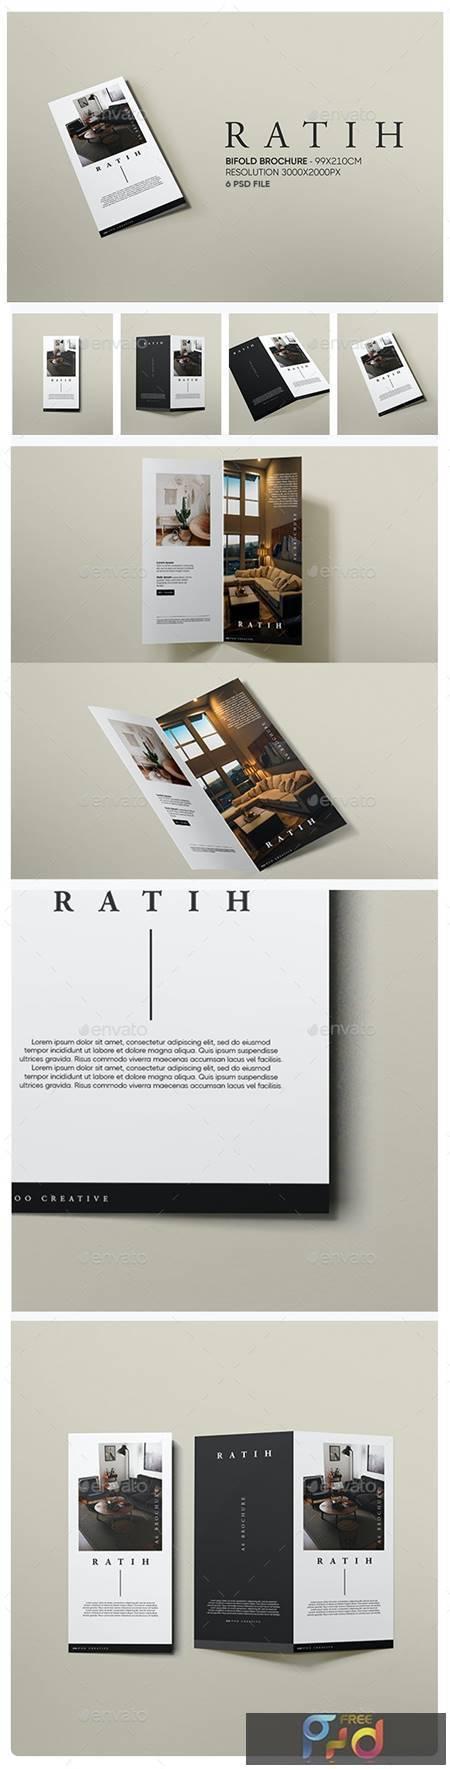 Ratih - DL Bifold Brochure Mockup - 29384754 1